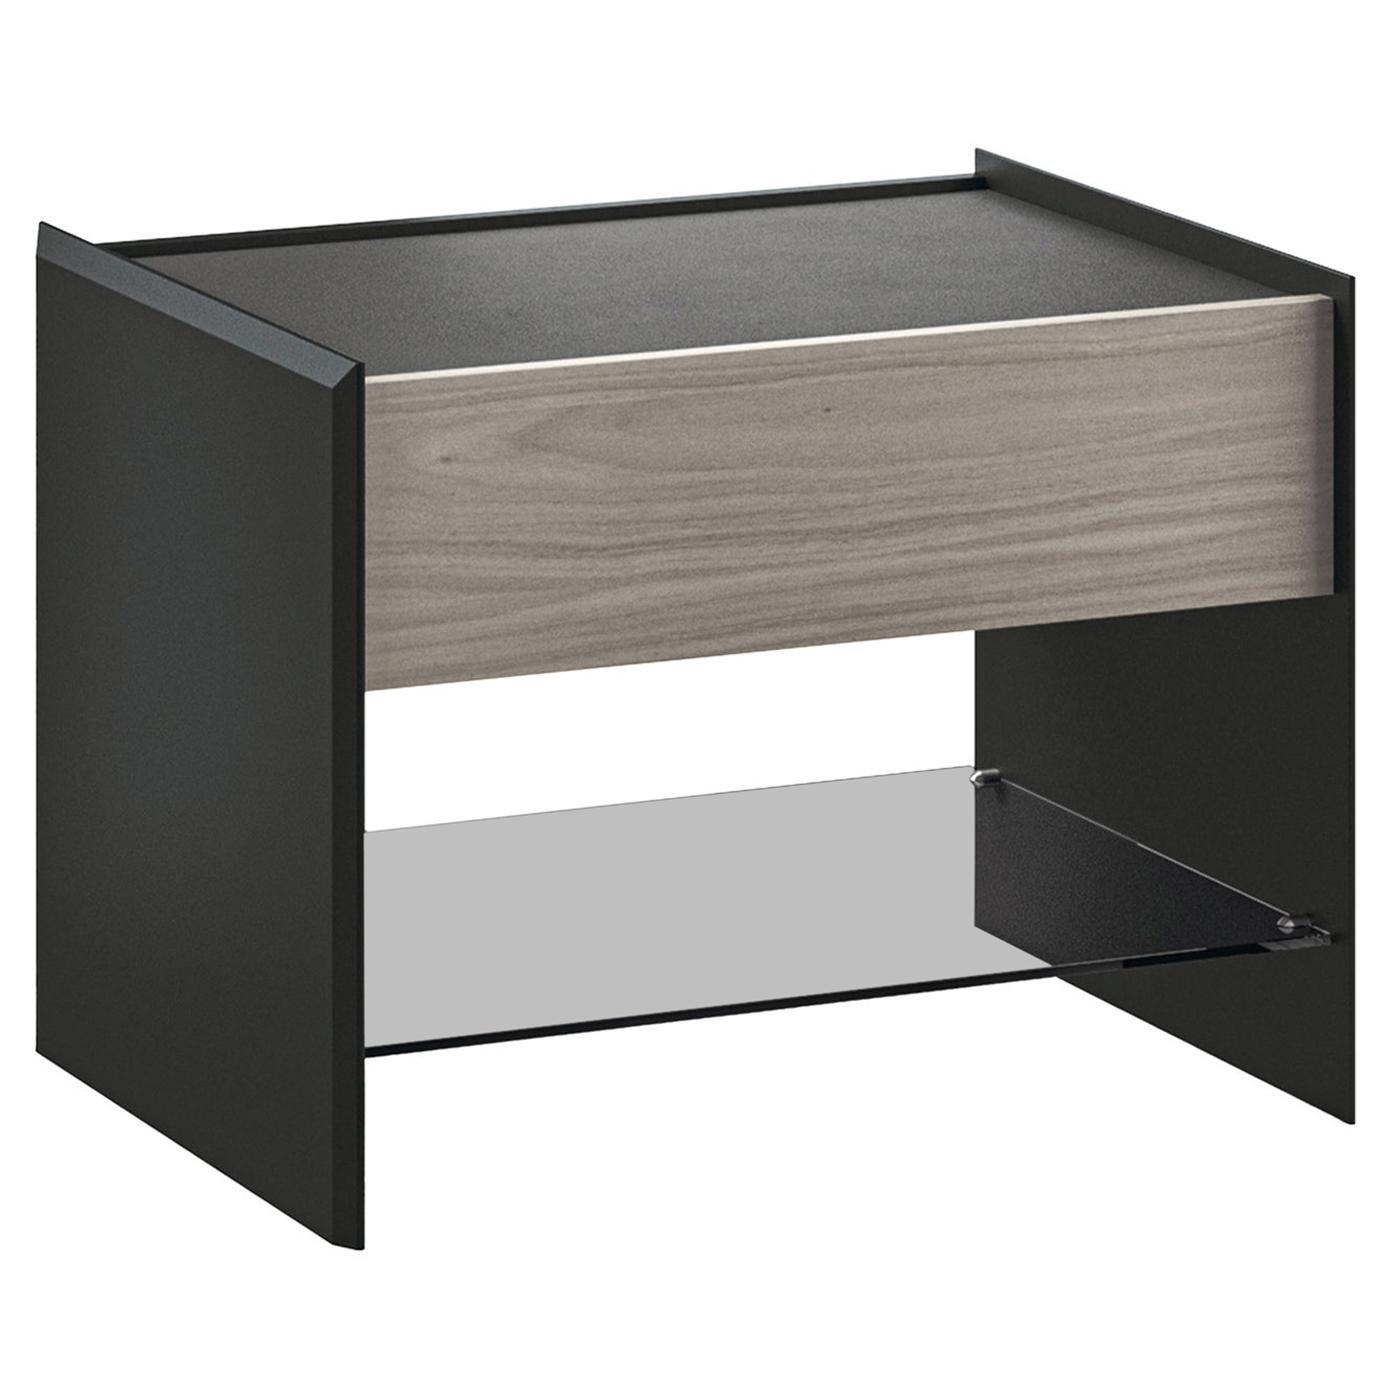 Dalton Bedside Table